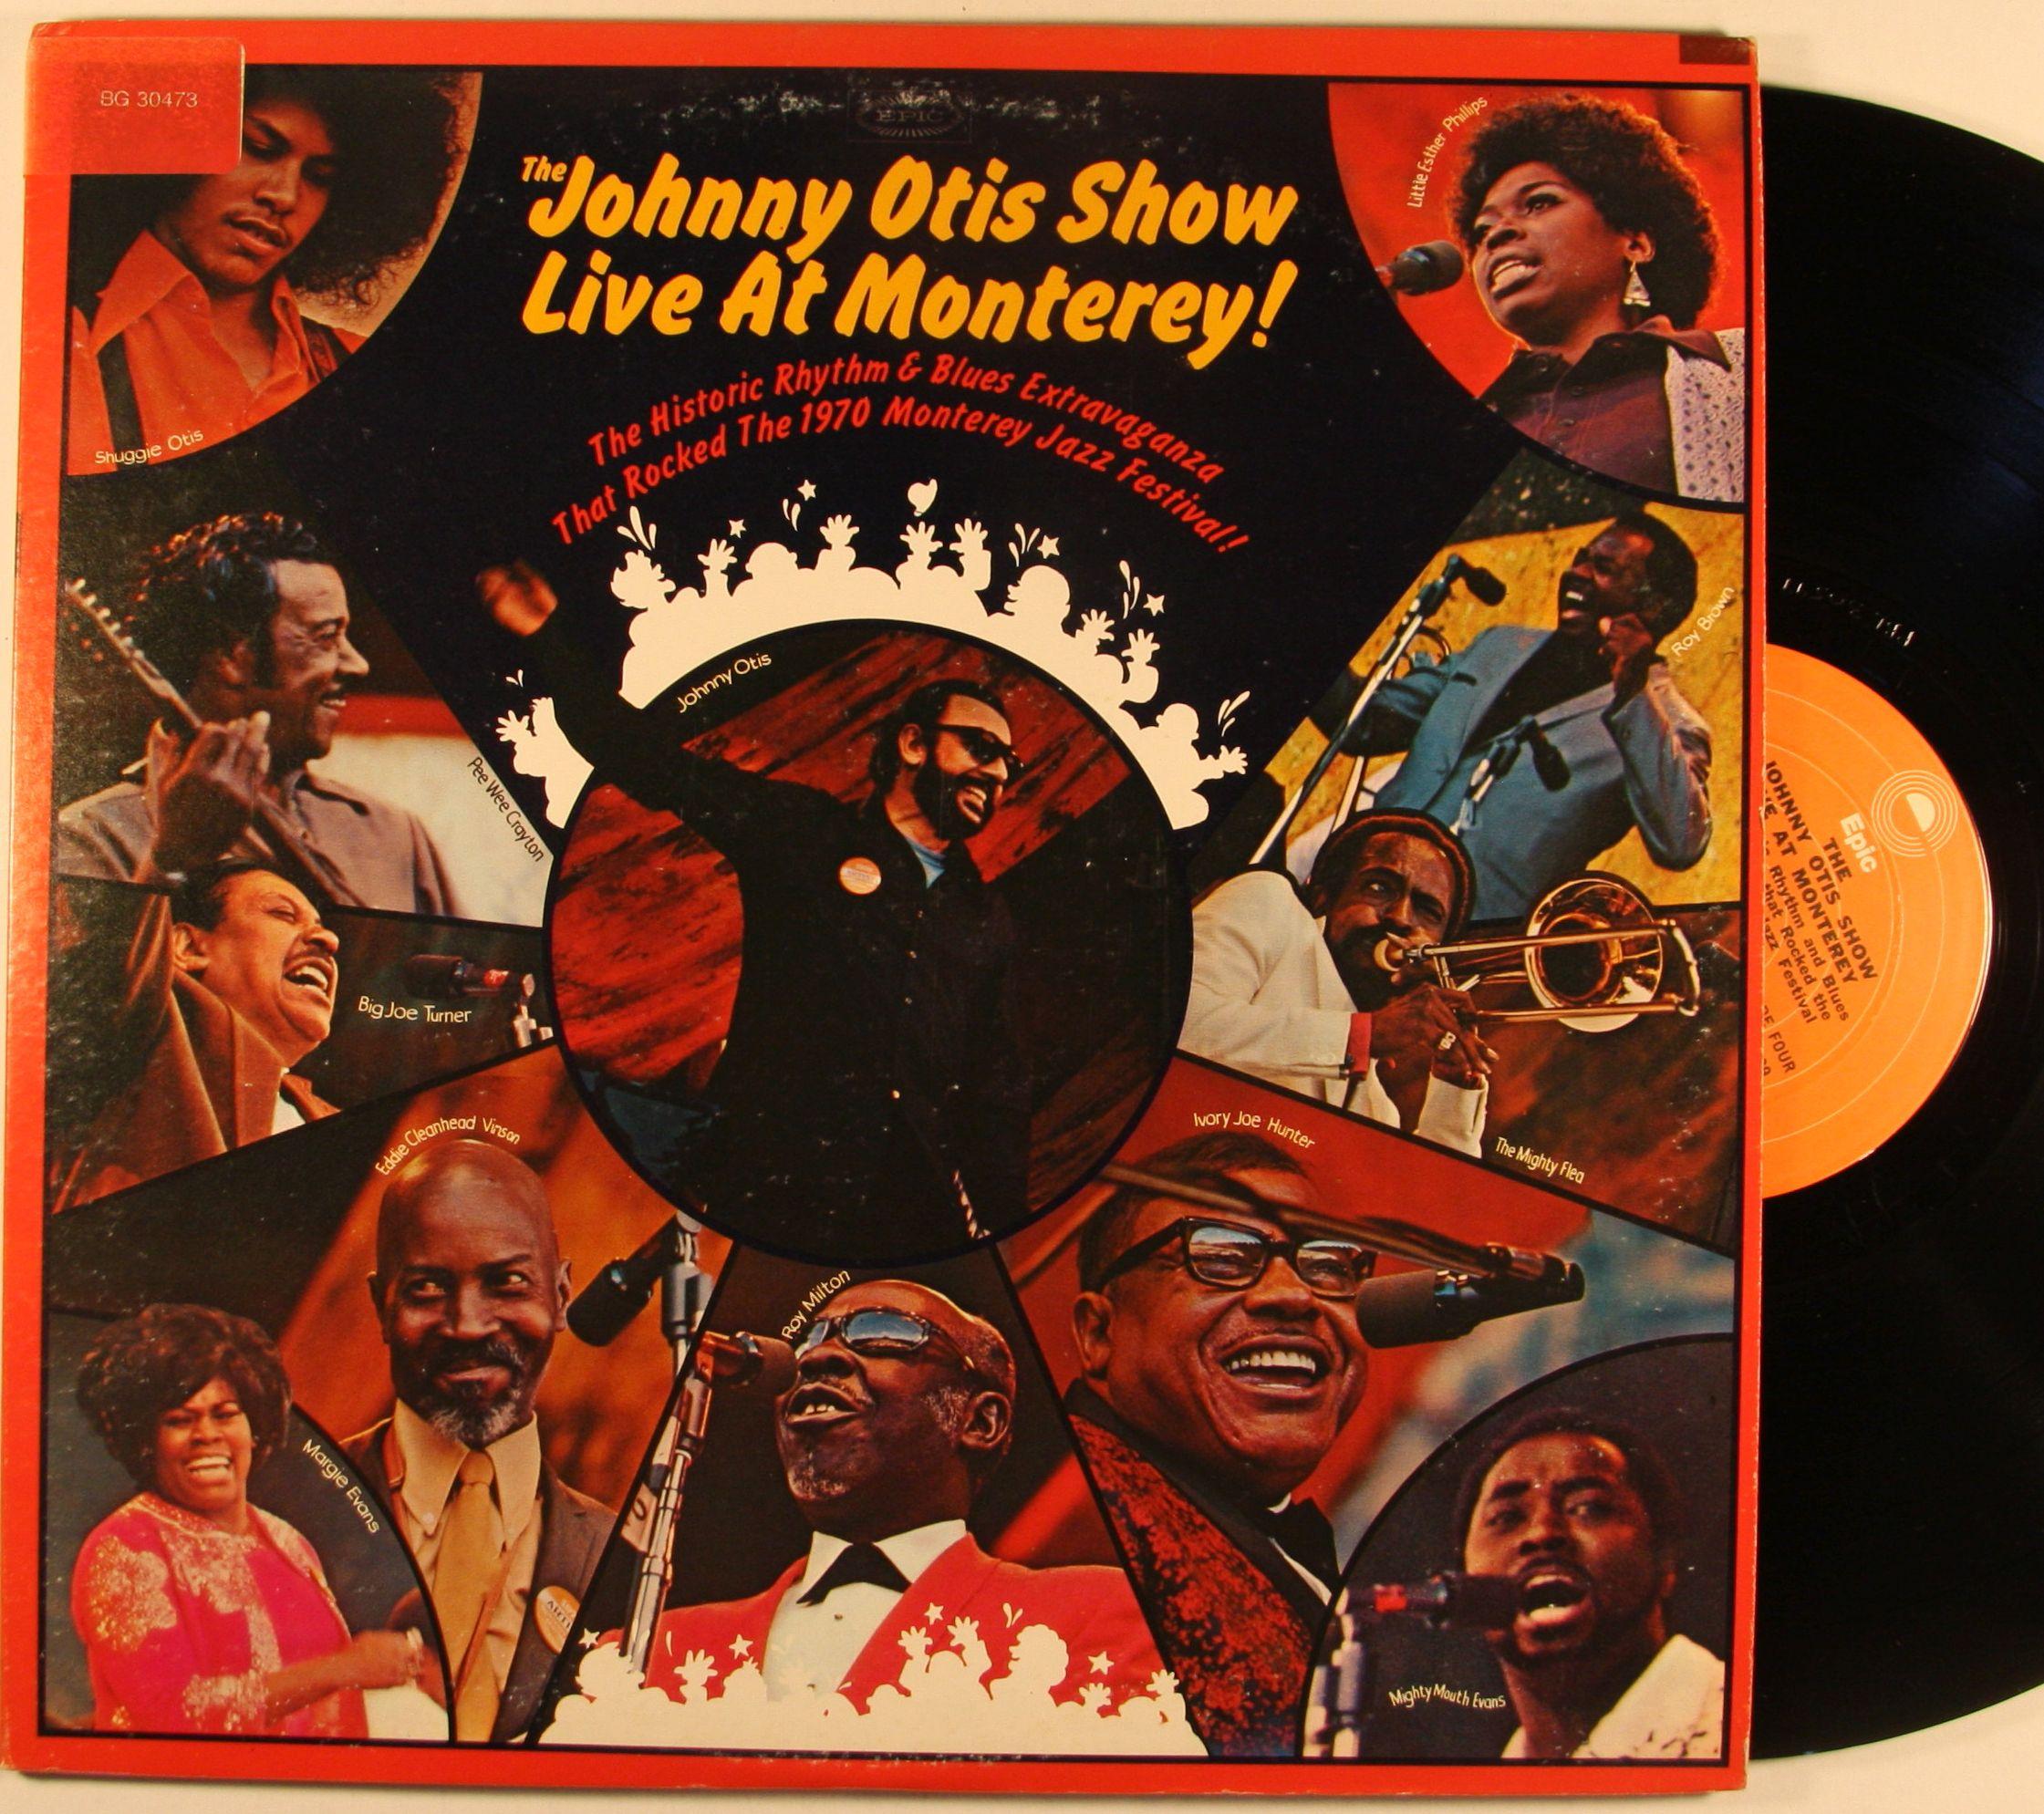 Johnny Otis - The Johnny Otis Show Live At Monterey